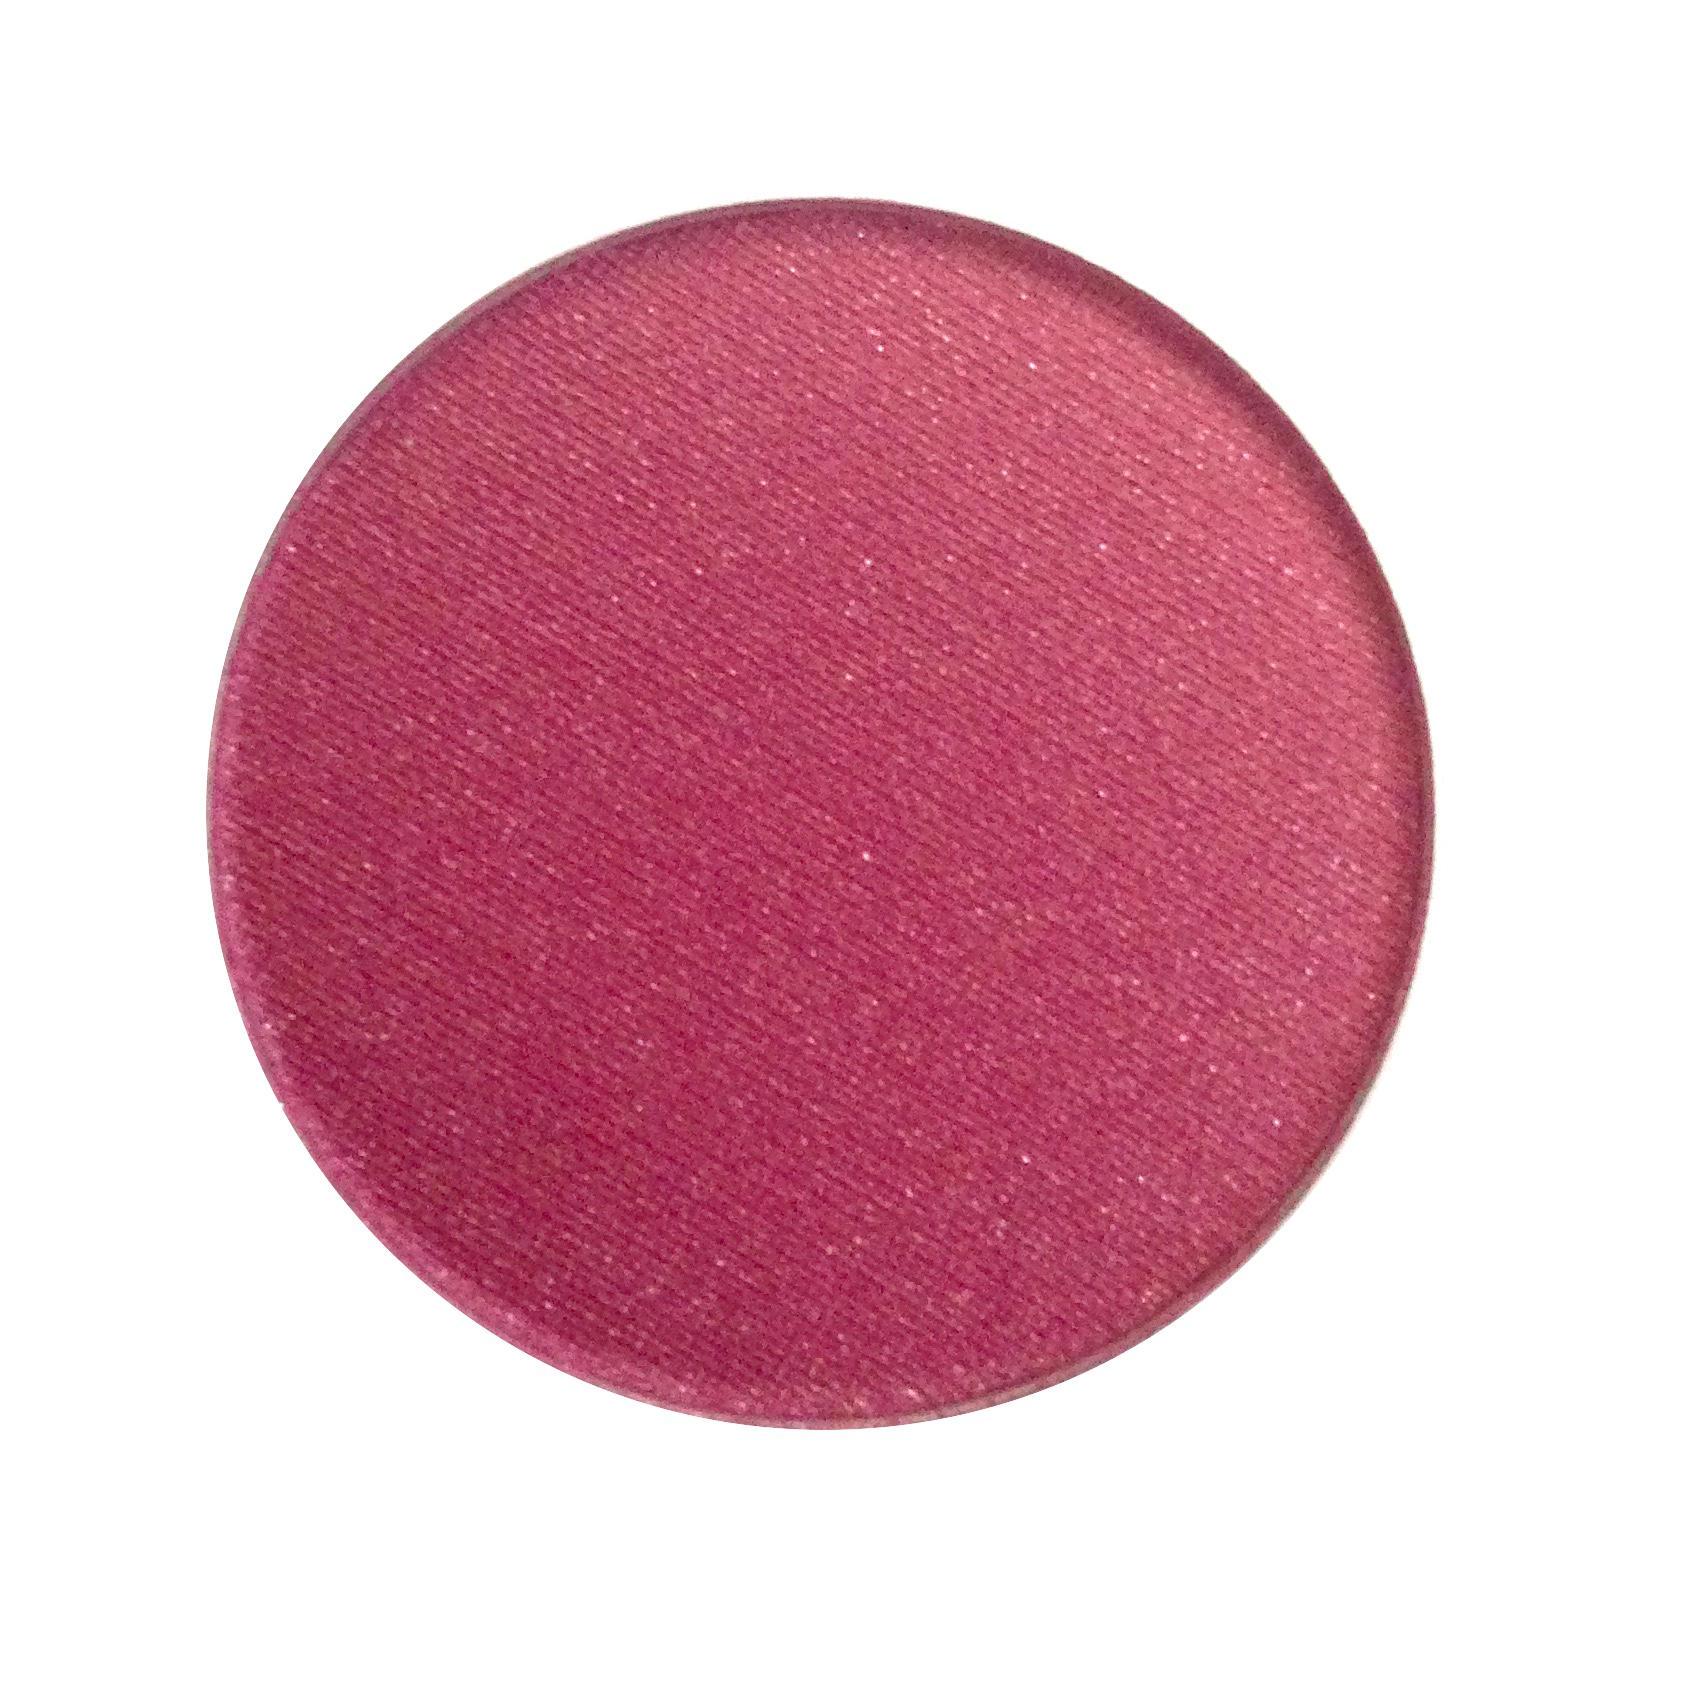 Inglot Round Eyeshadow Refill Raspberry Glimmer AMC 74